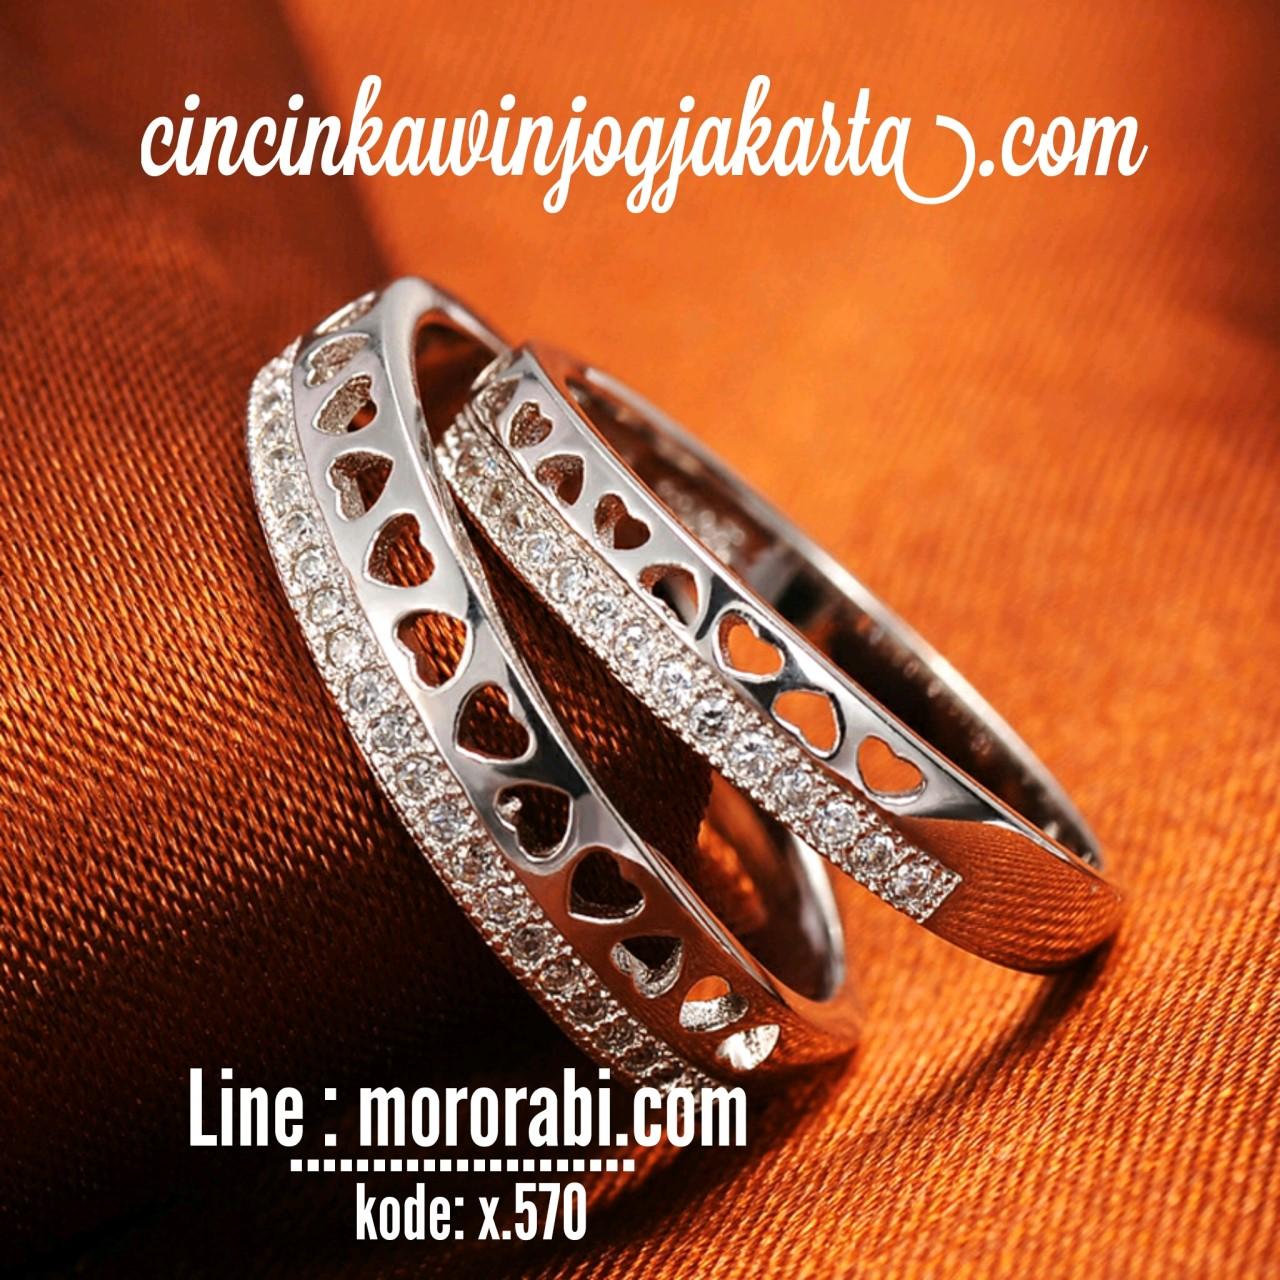 Jogja Blanja Shop Line Cincin Pernikahan Palladium 023 032 American Diamond A Iii